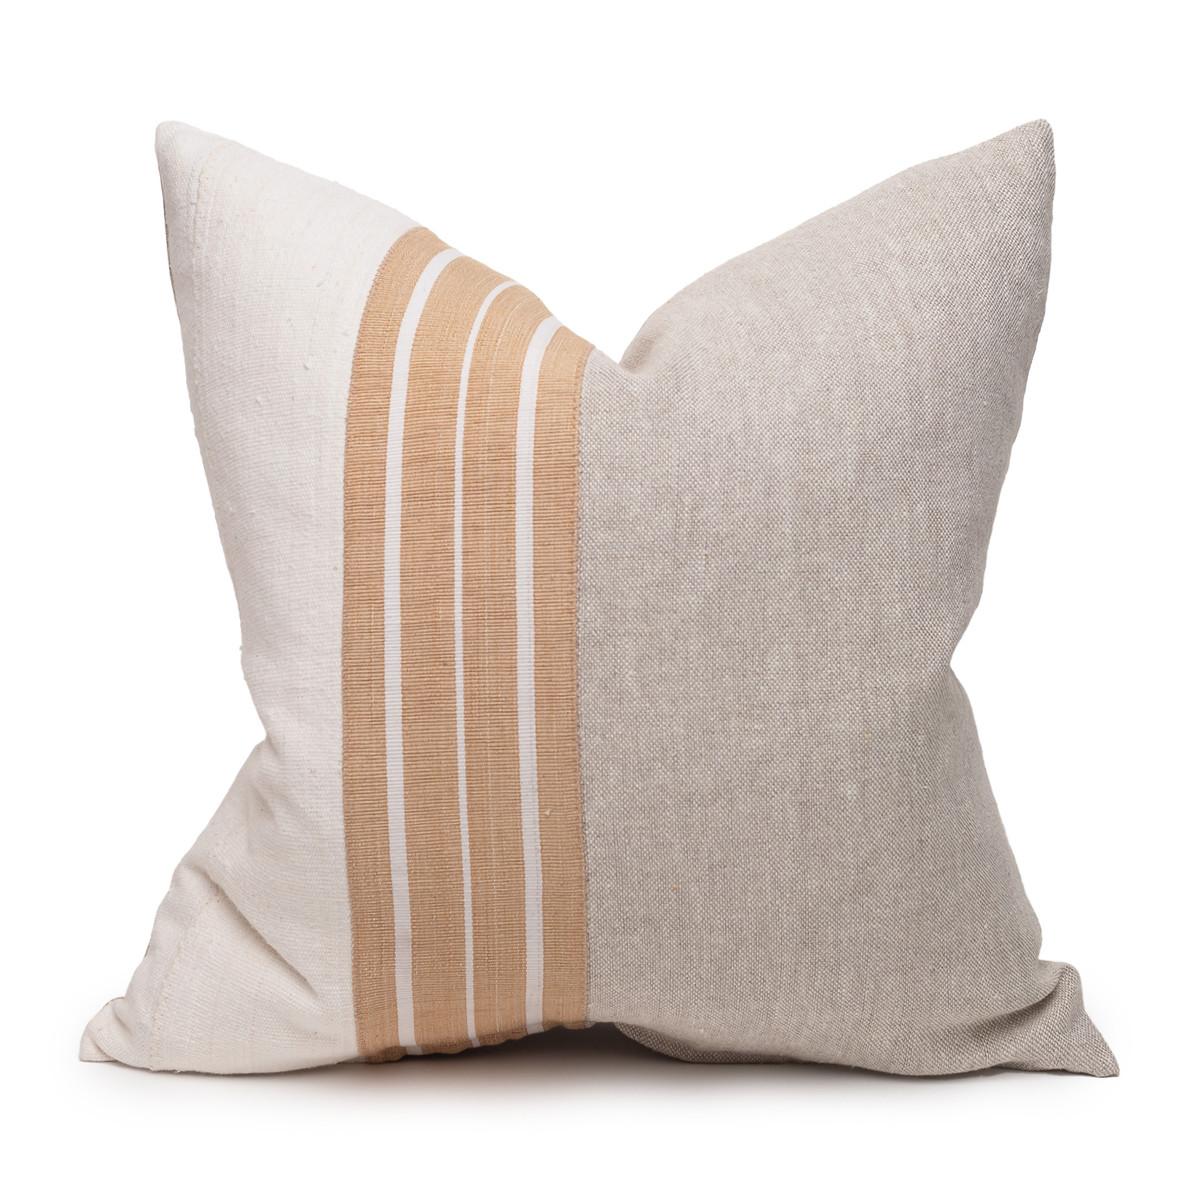 Coast Natural Linen Aso Oke Stripe Luxe Vintage Pillow - 22 - Front